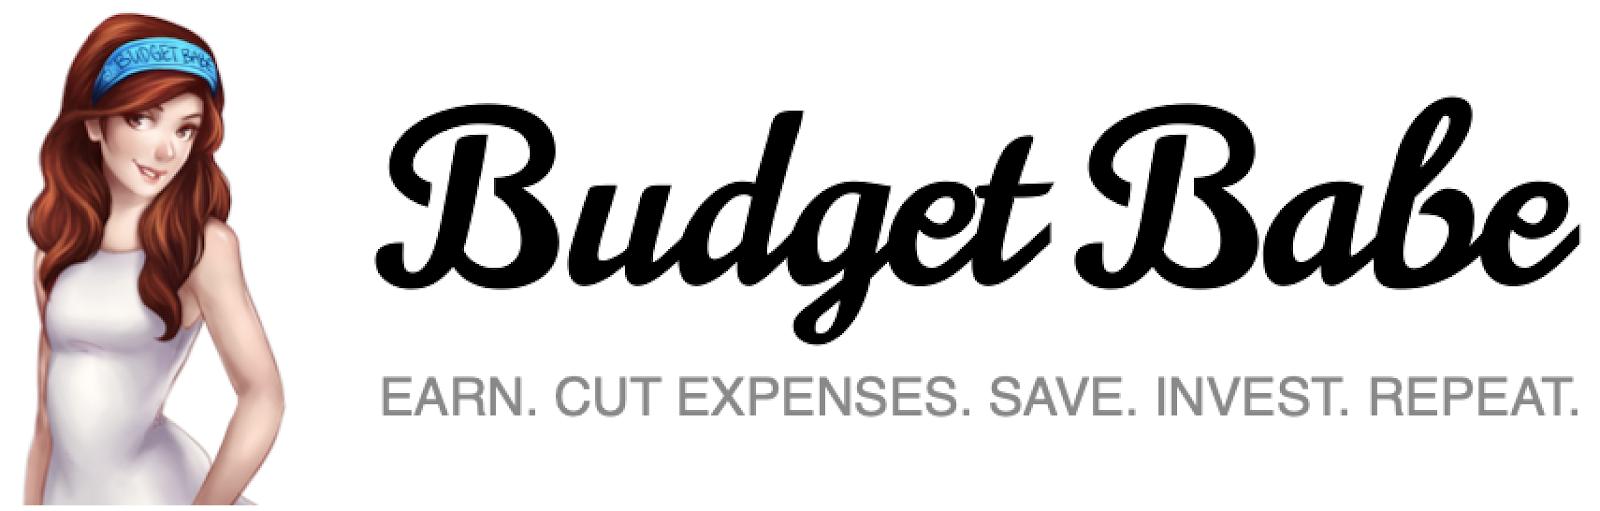 SG Budget Babe